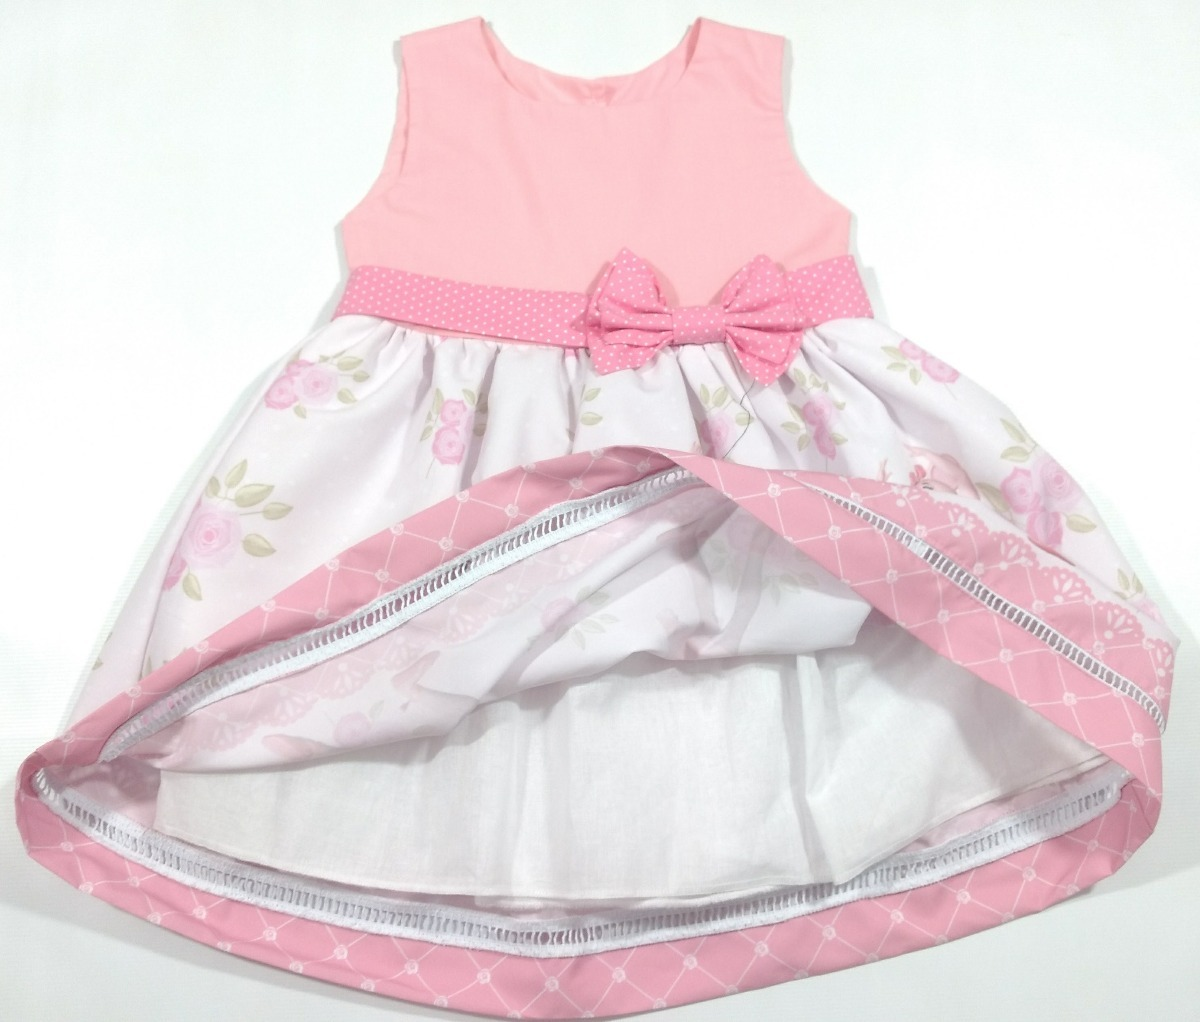 3534ebe4cb Vestido Festa Roupa Infantil Temático Angelina Bailarina - R$ 95,00 ...